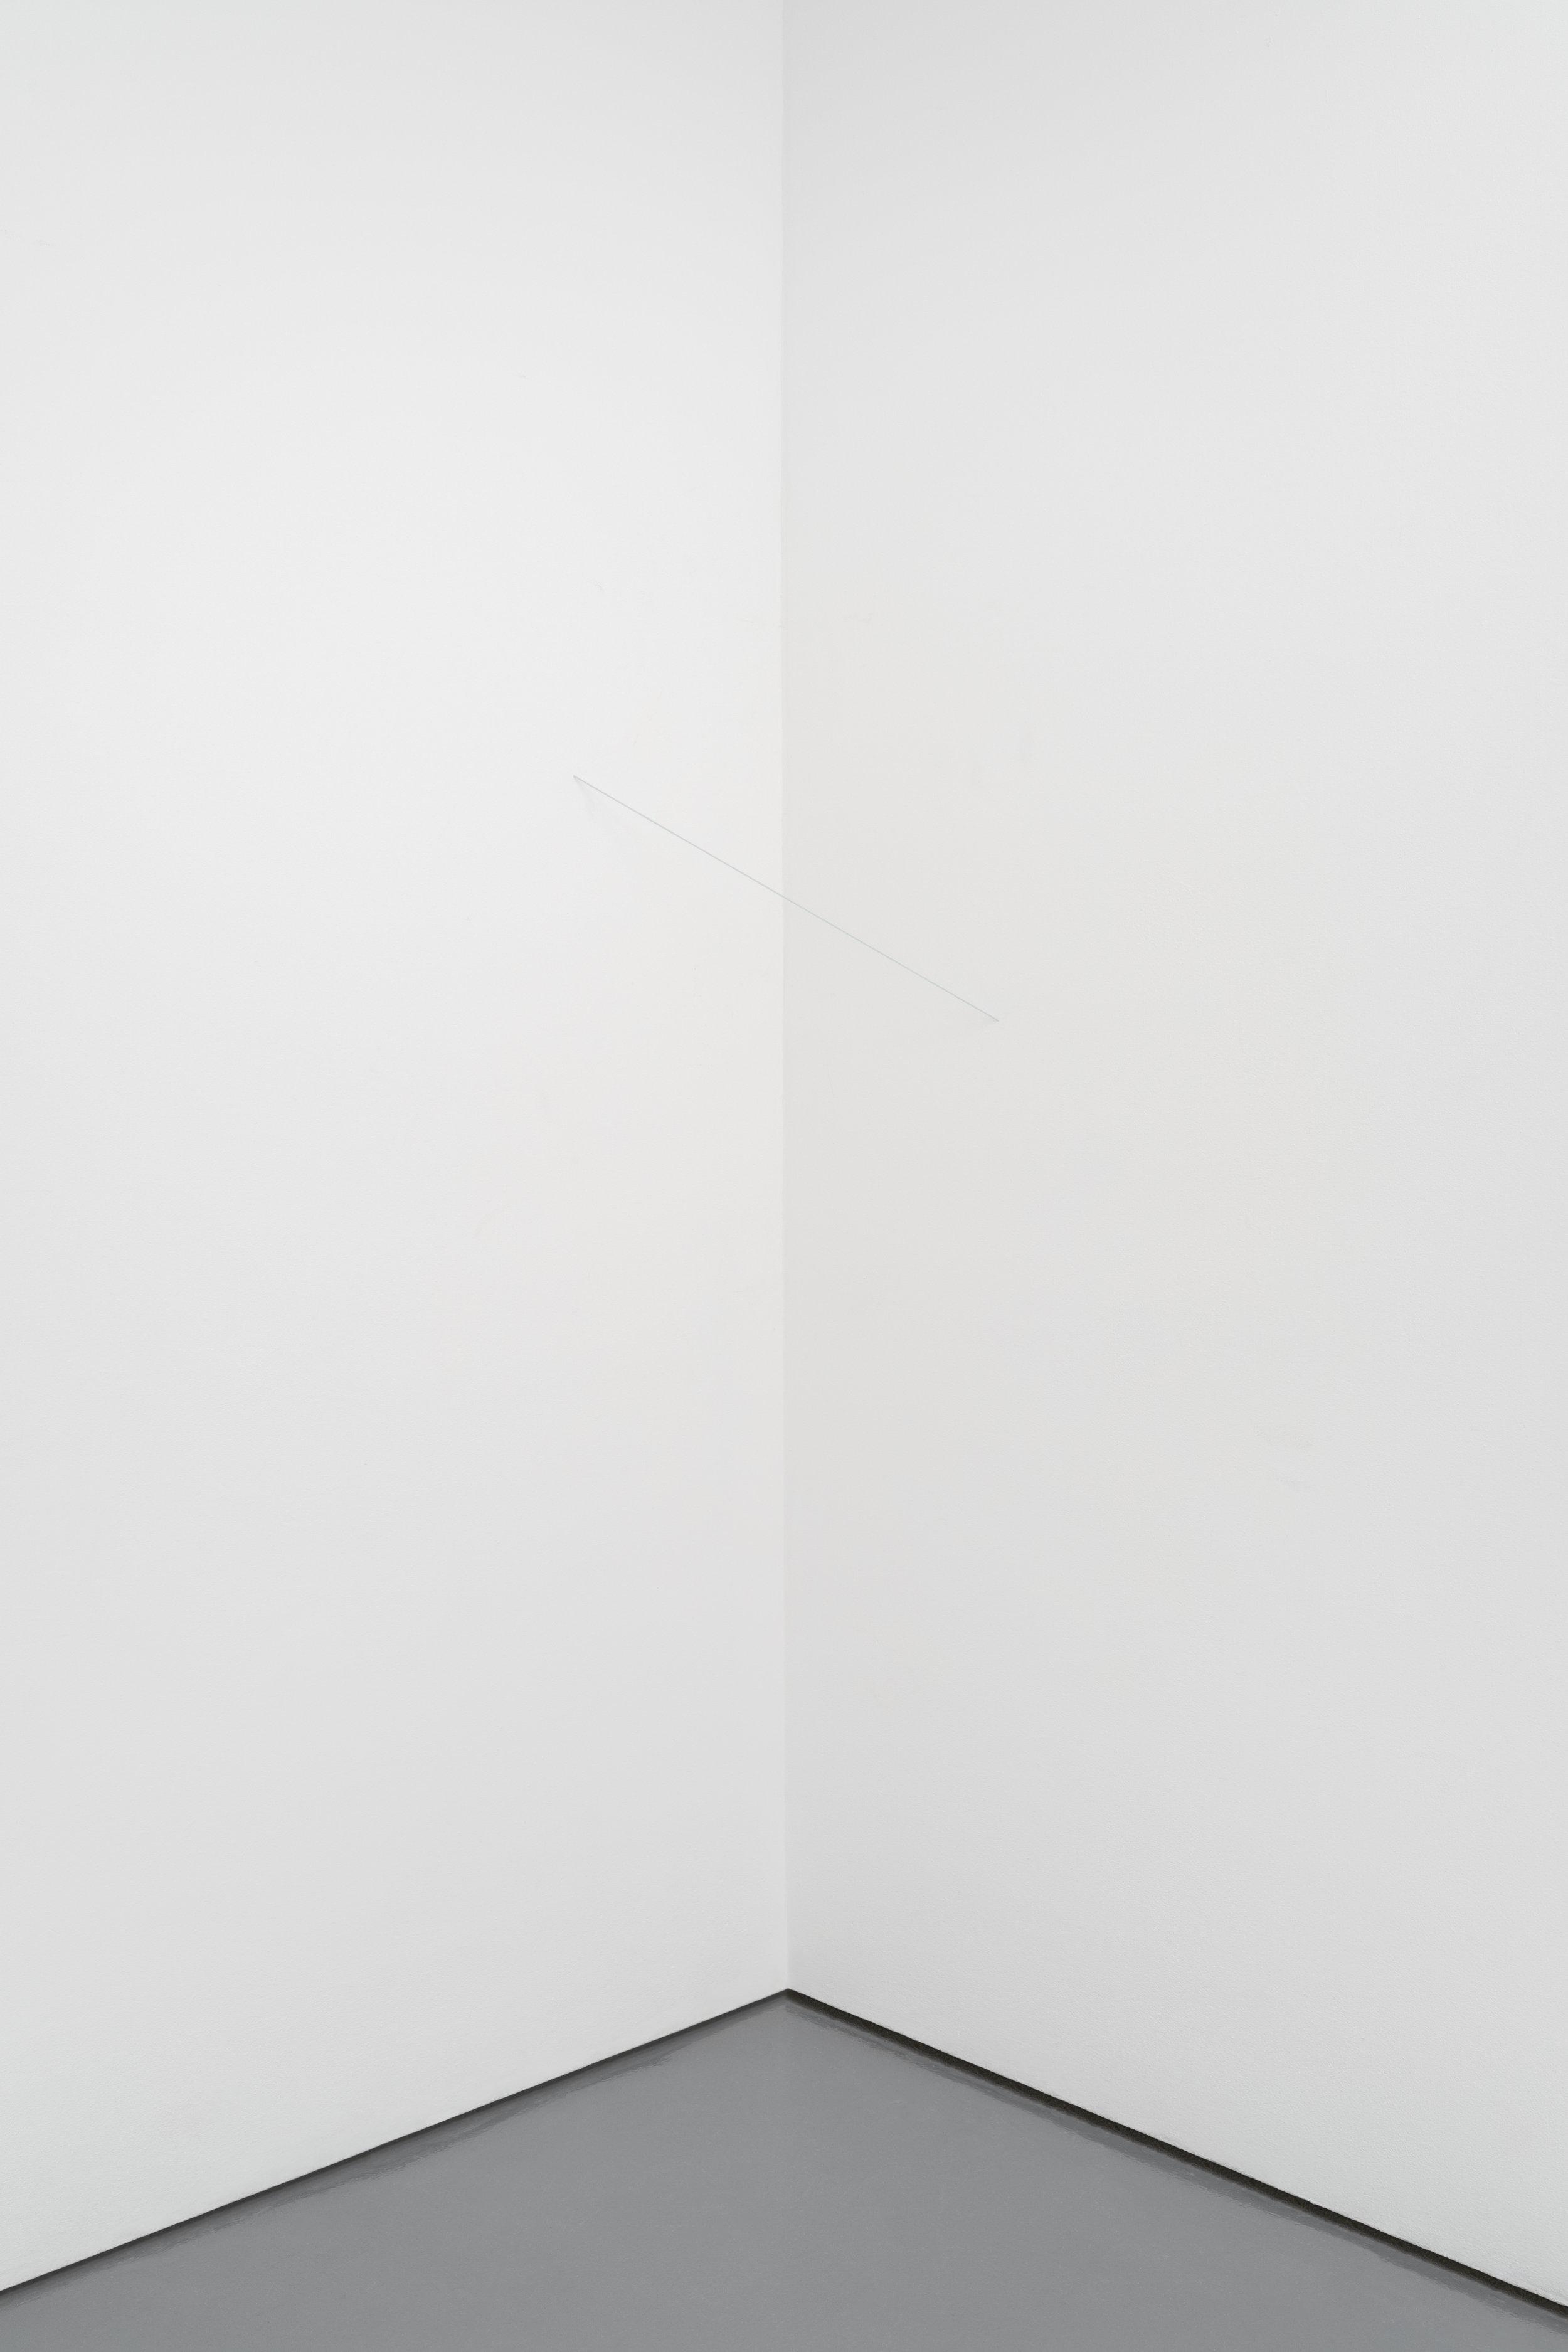 Untitled (Broken Line, Vertical Wall Construction)